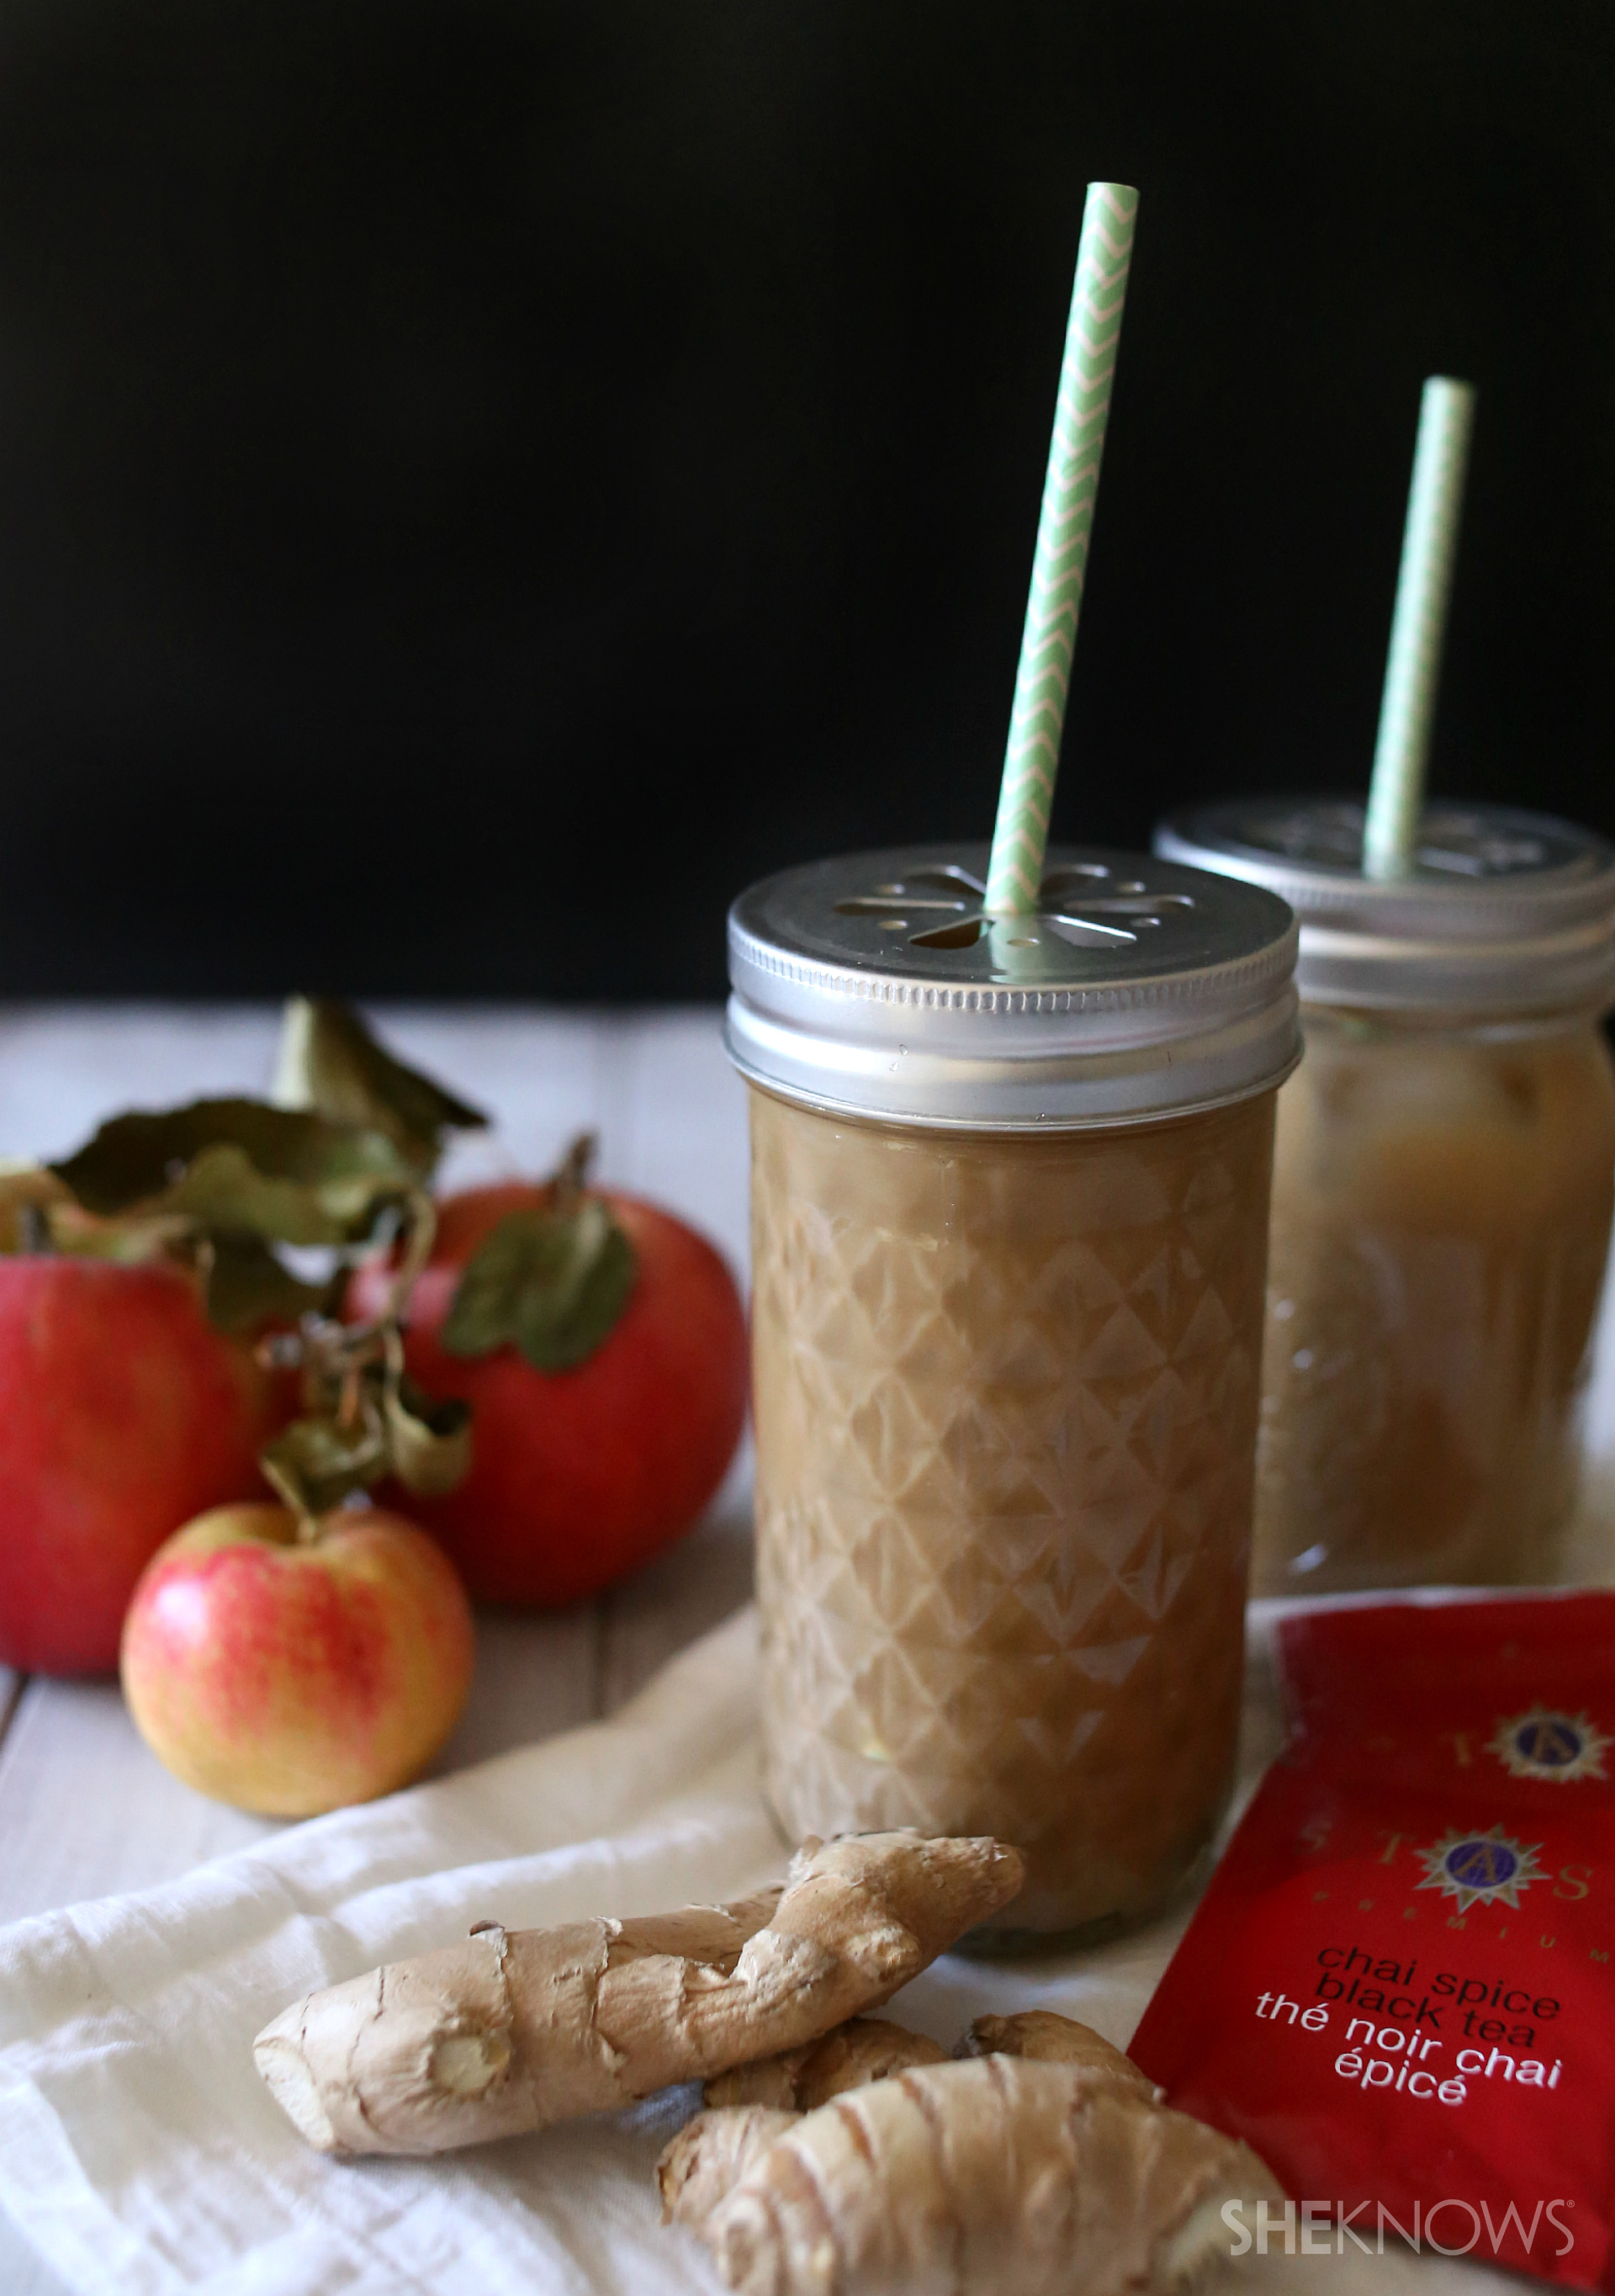 Starbucks copycat: iced chai latte